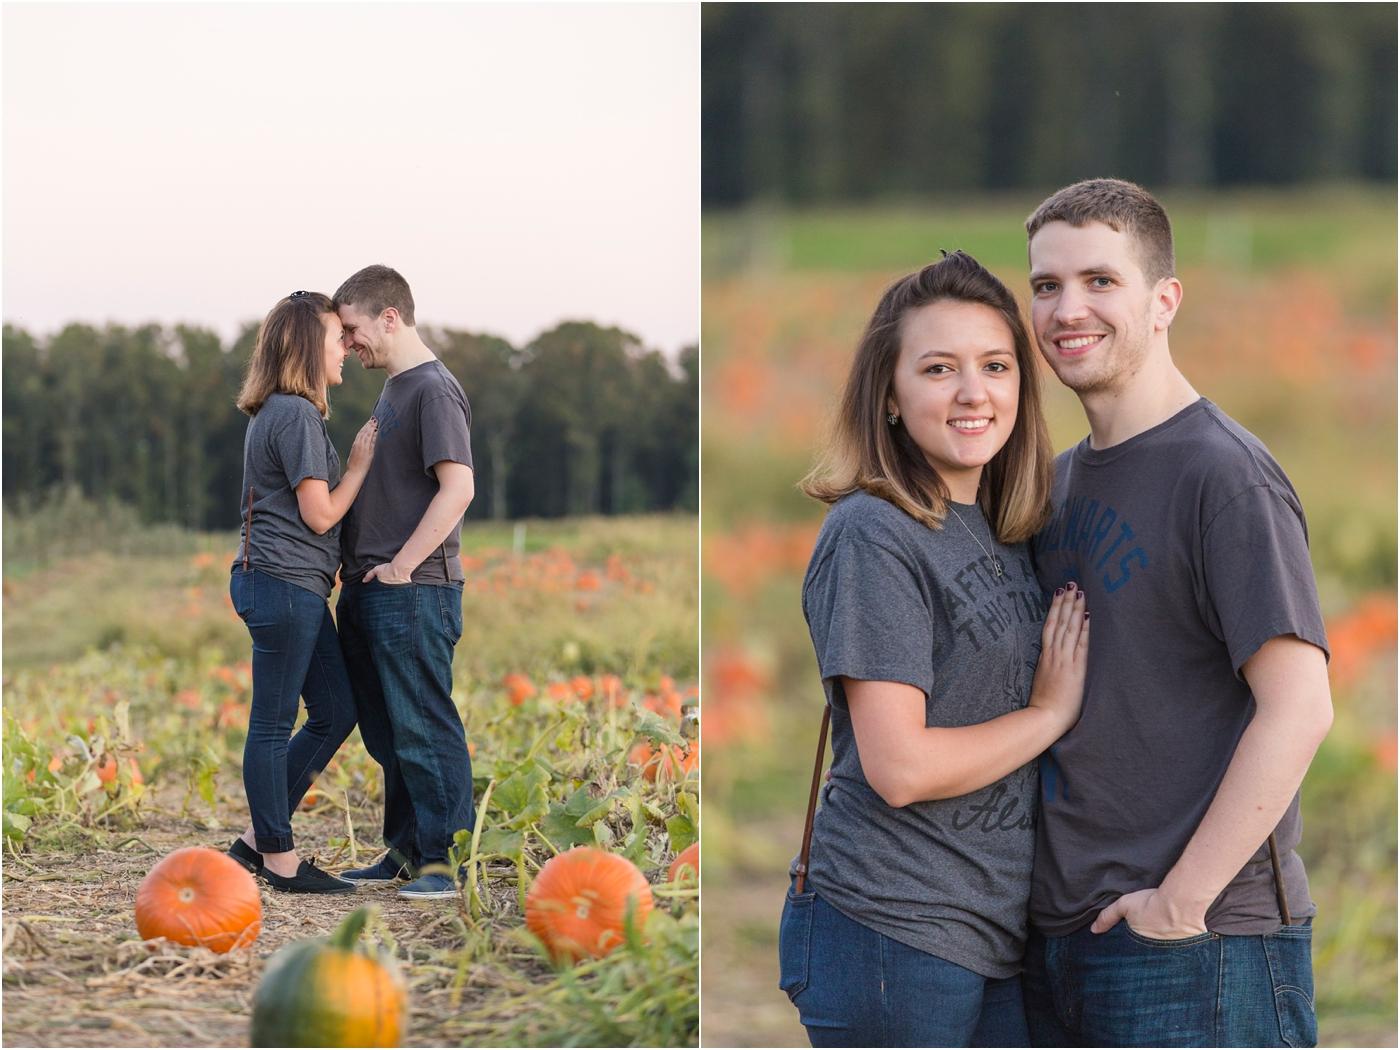 Larriland-Farm-Engagement-Photo_0033.jpg